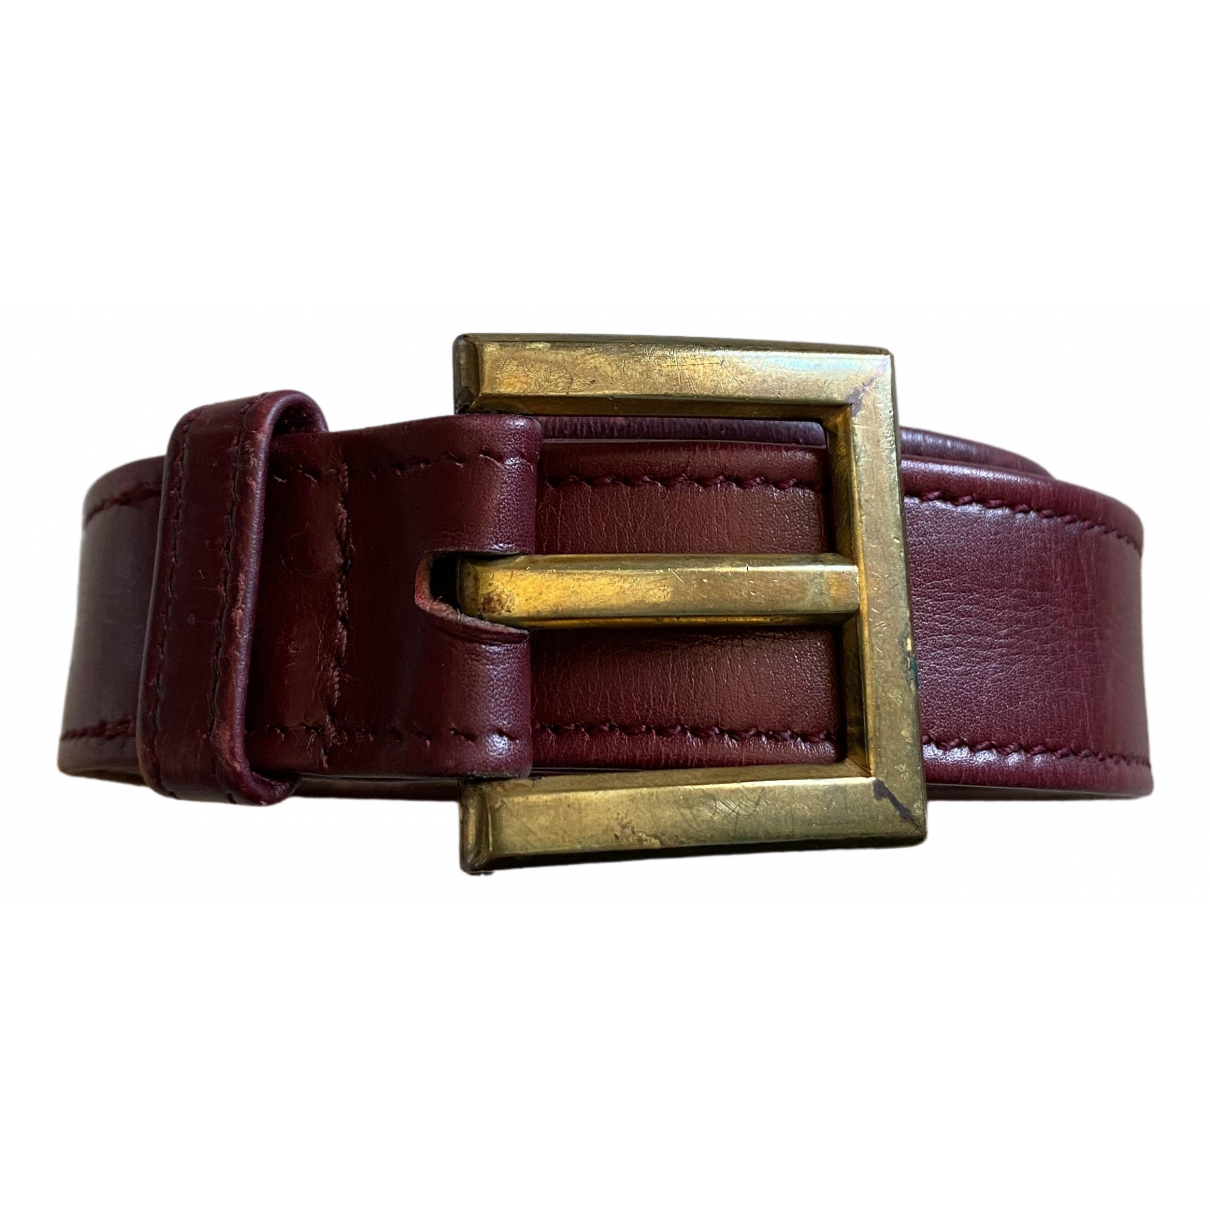 Hermès \N Burgundy Leather belt for Women M International